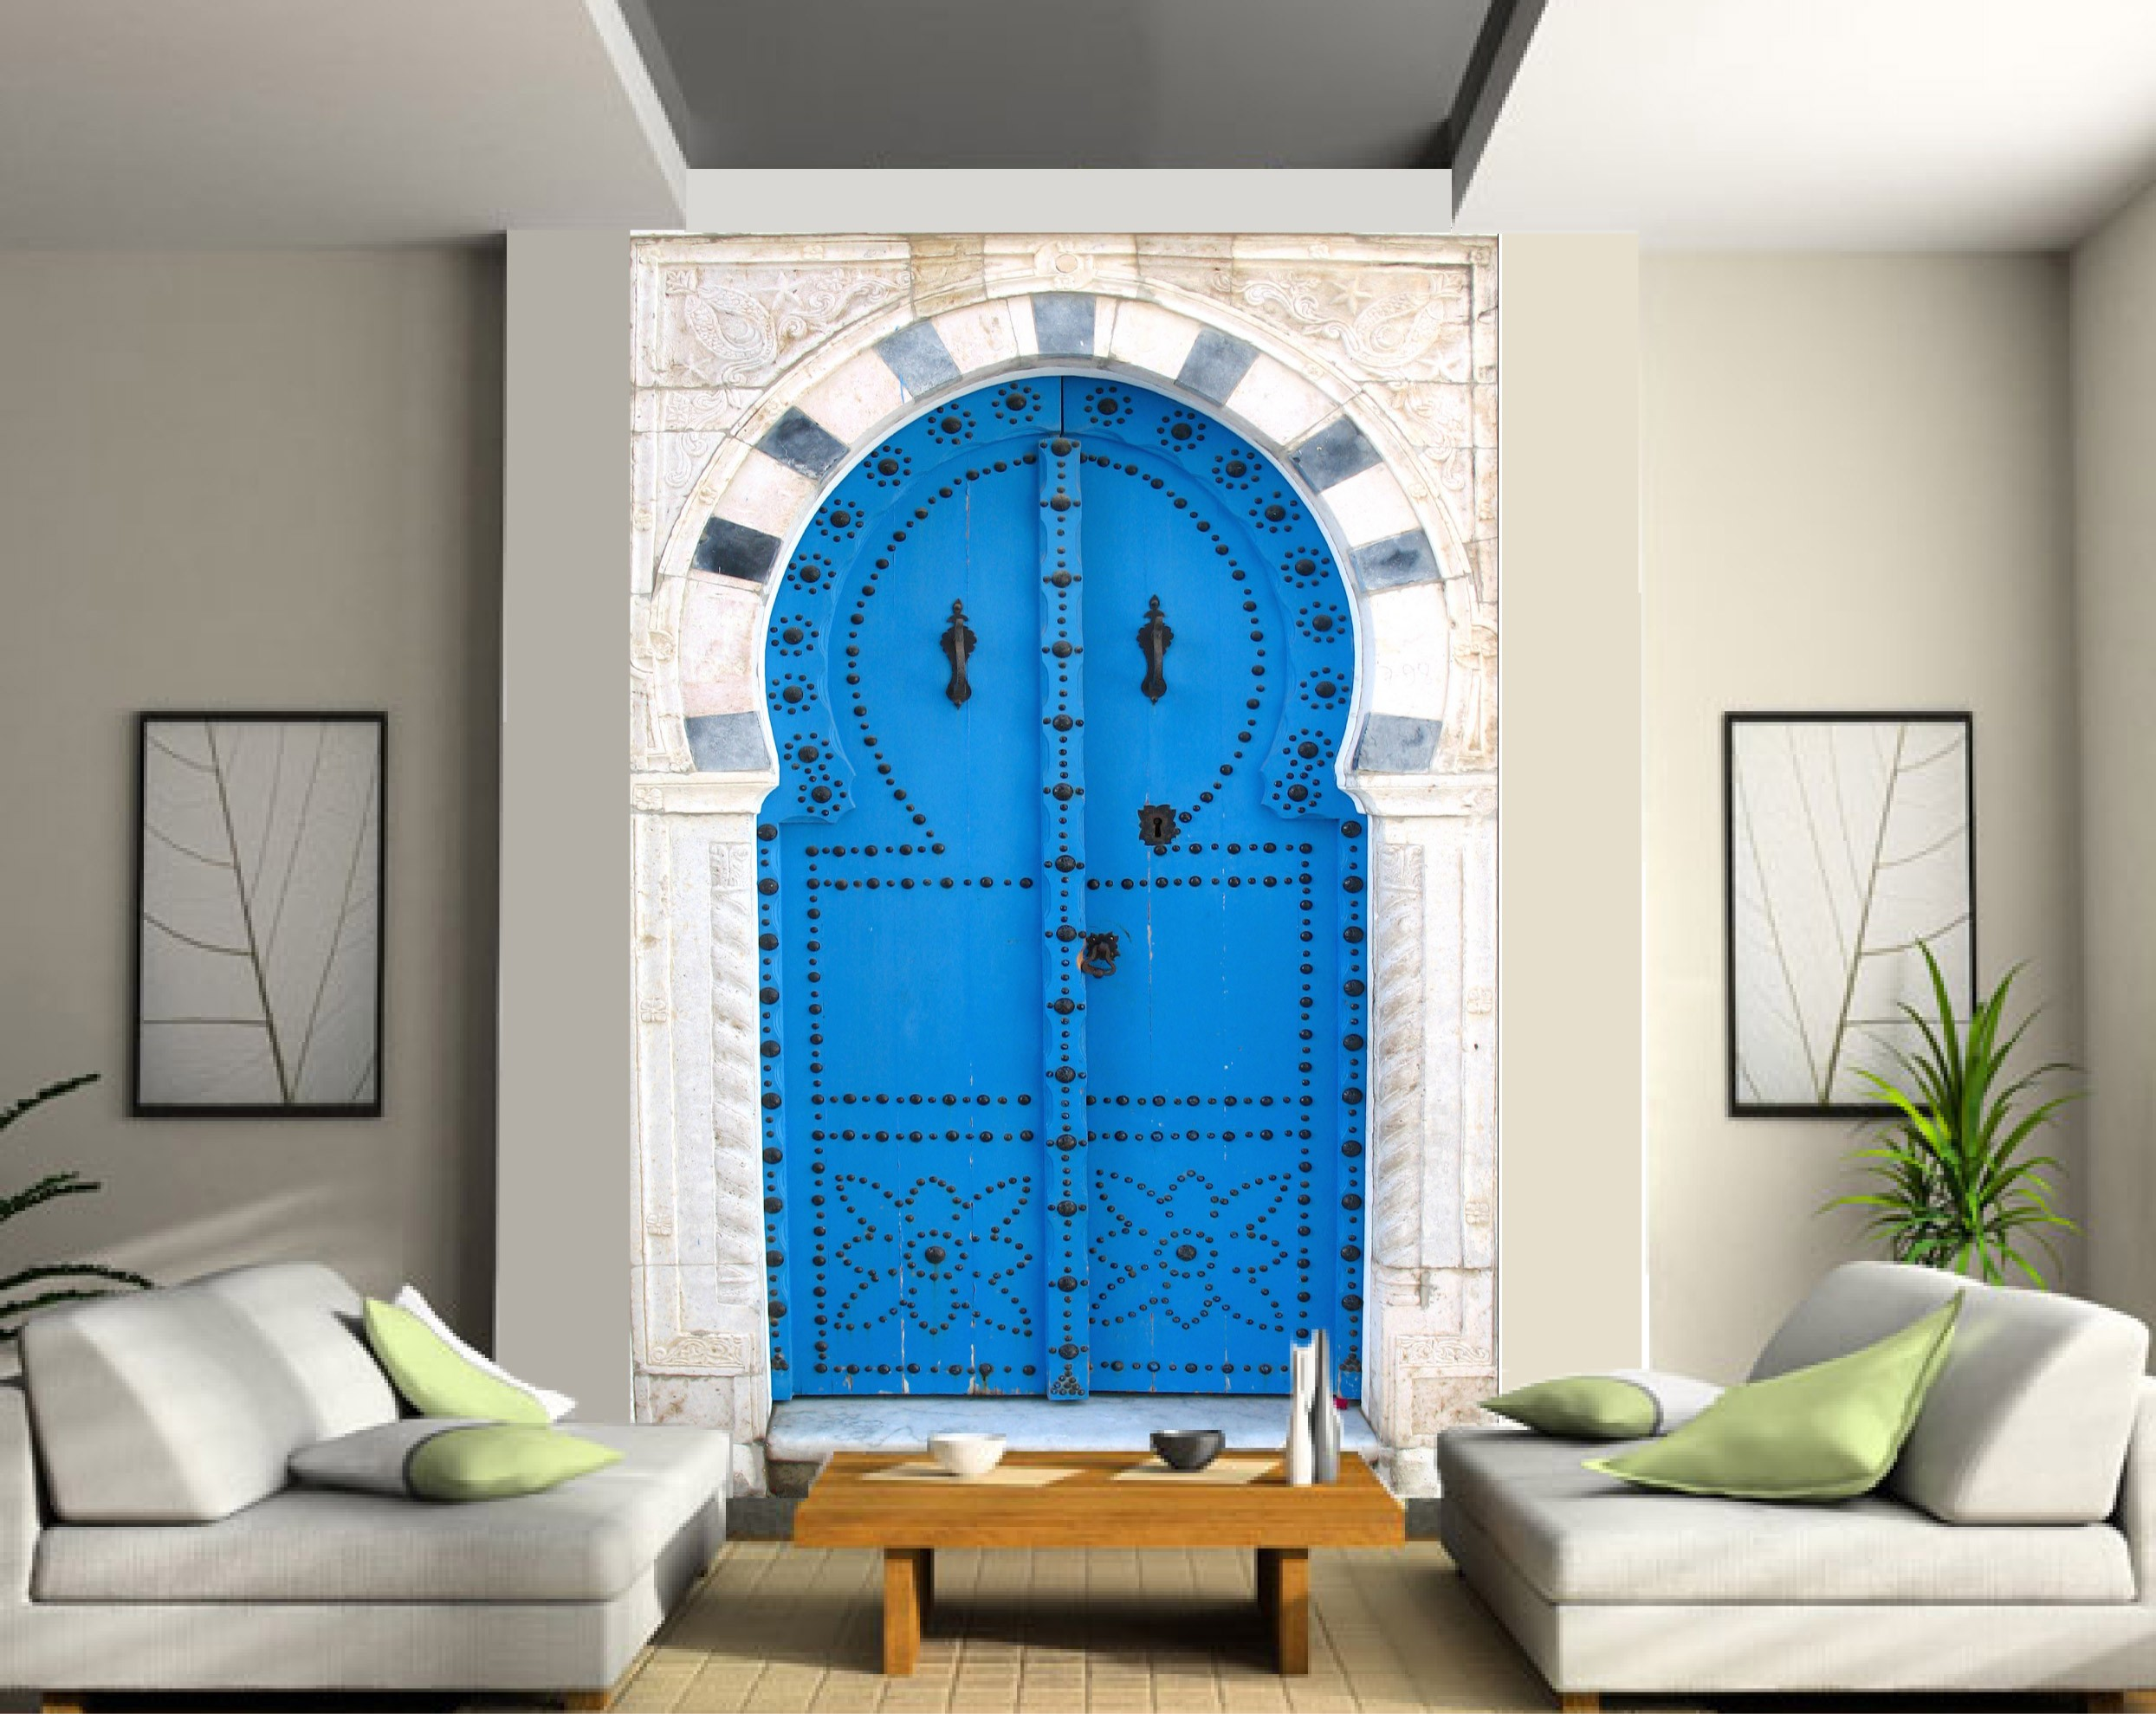 Beautiful Salle De Bain Orientale Bleue Pictures - House Design ...